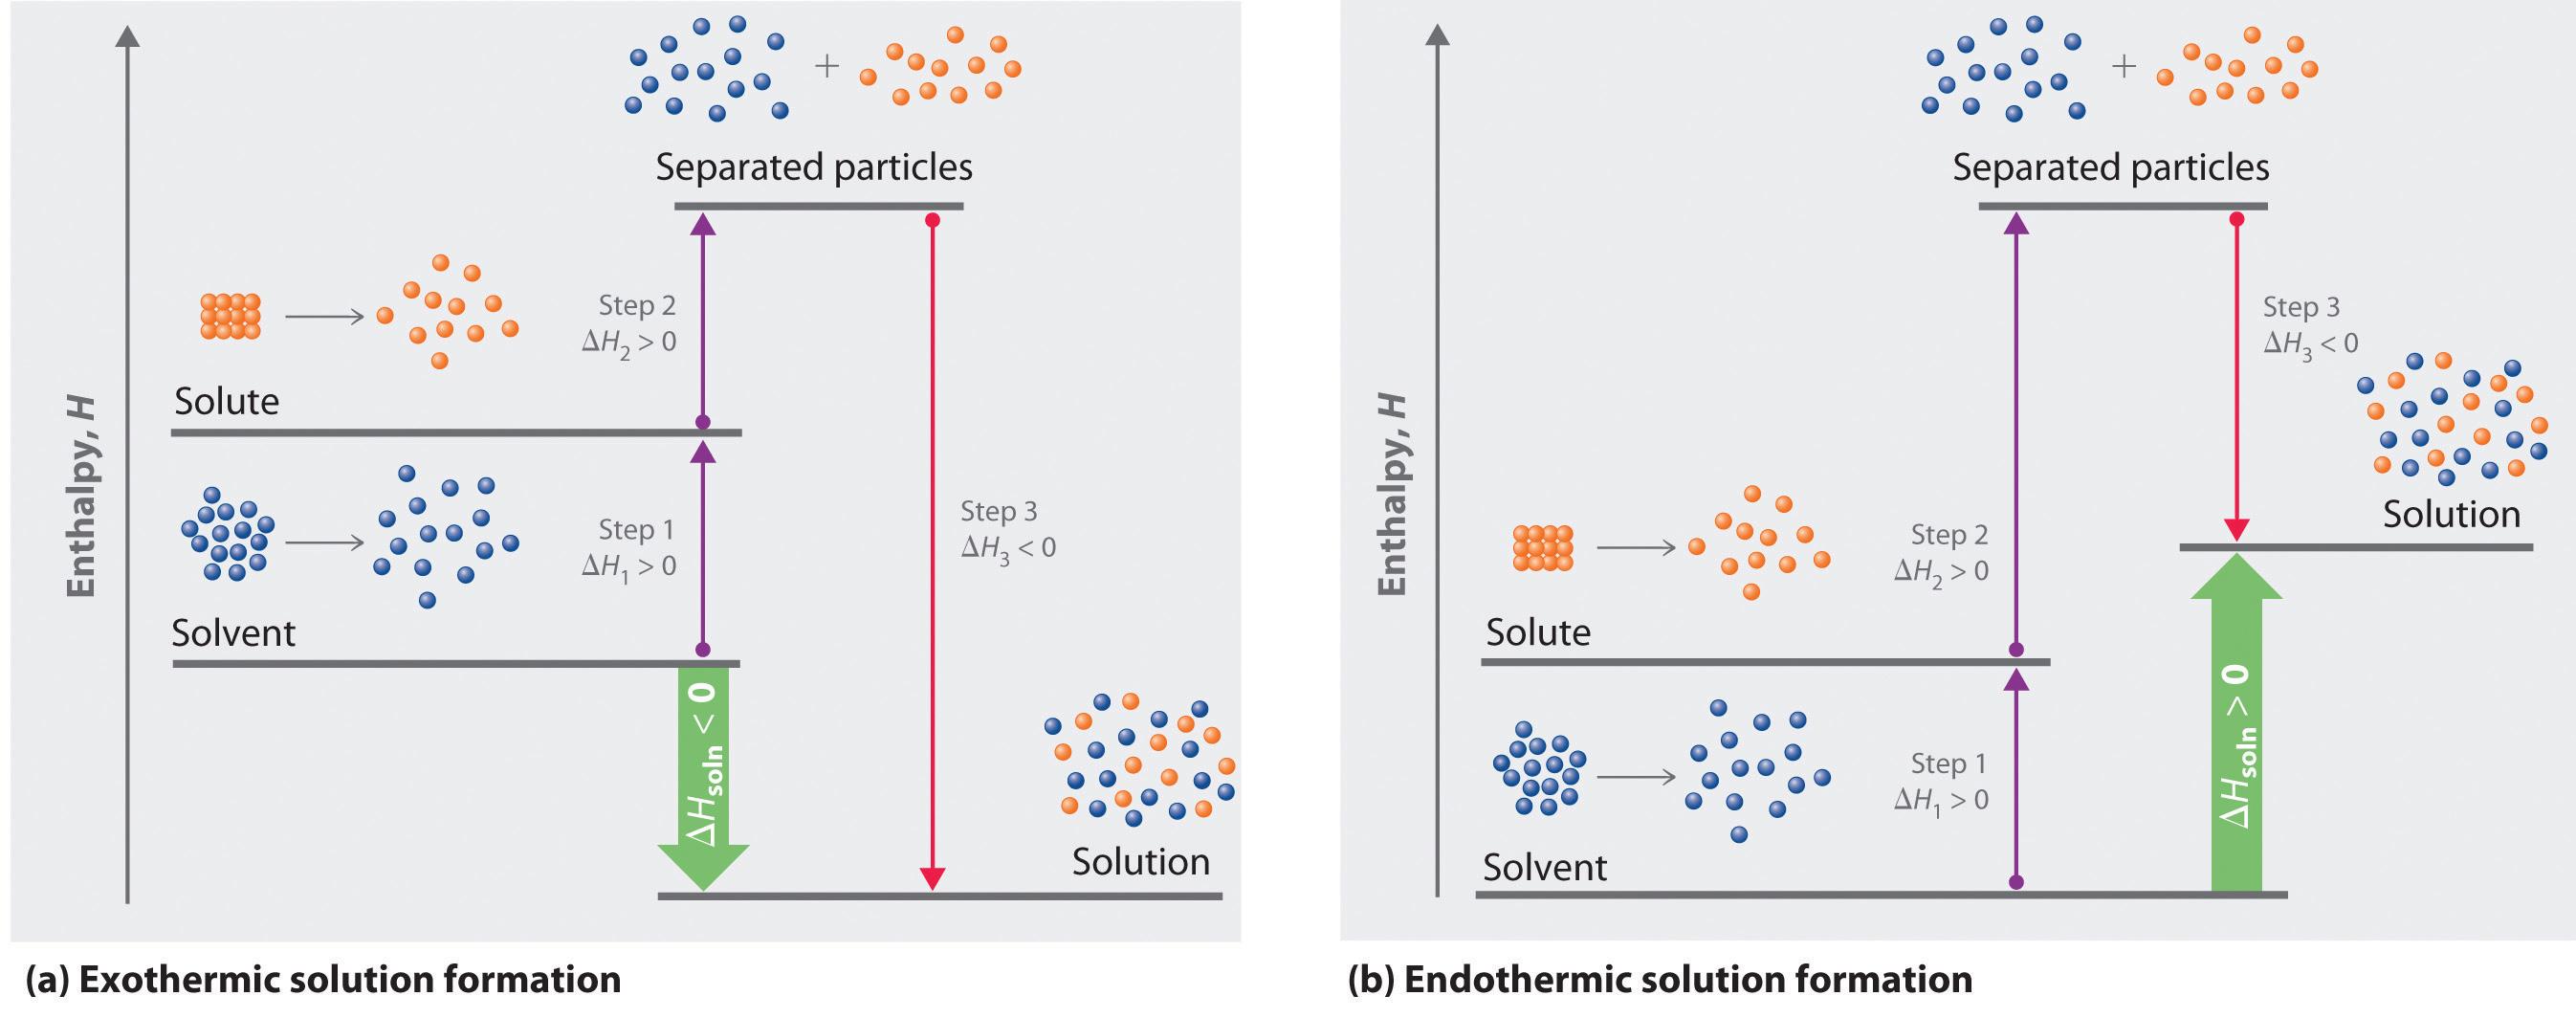 Chem 103 Lab Enthalpy Of Solution